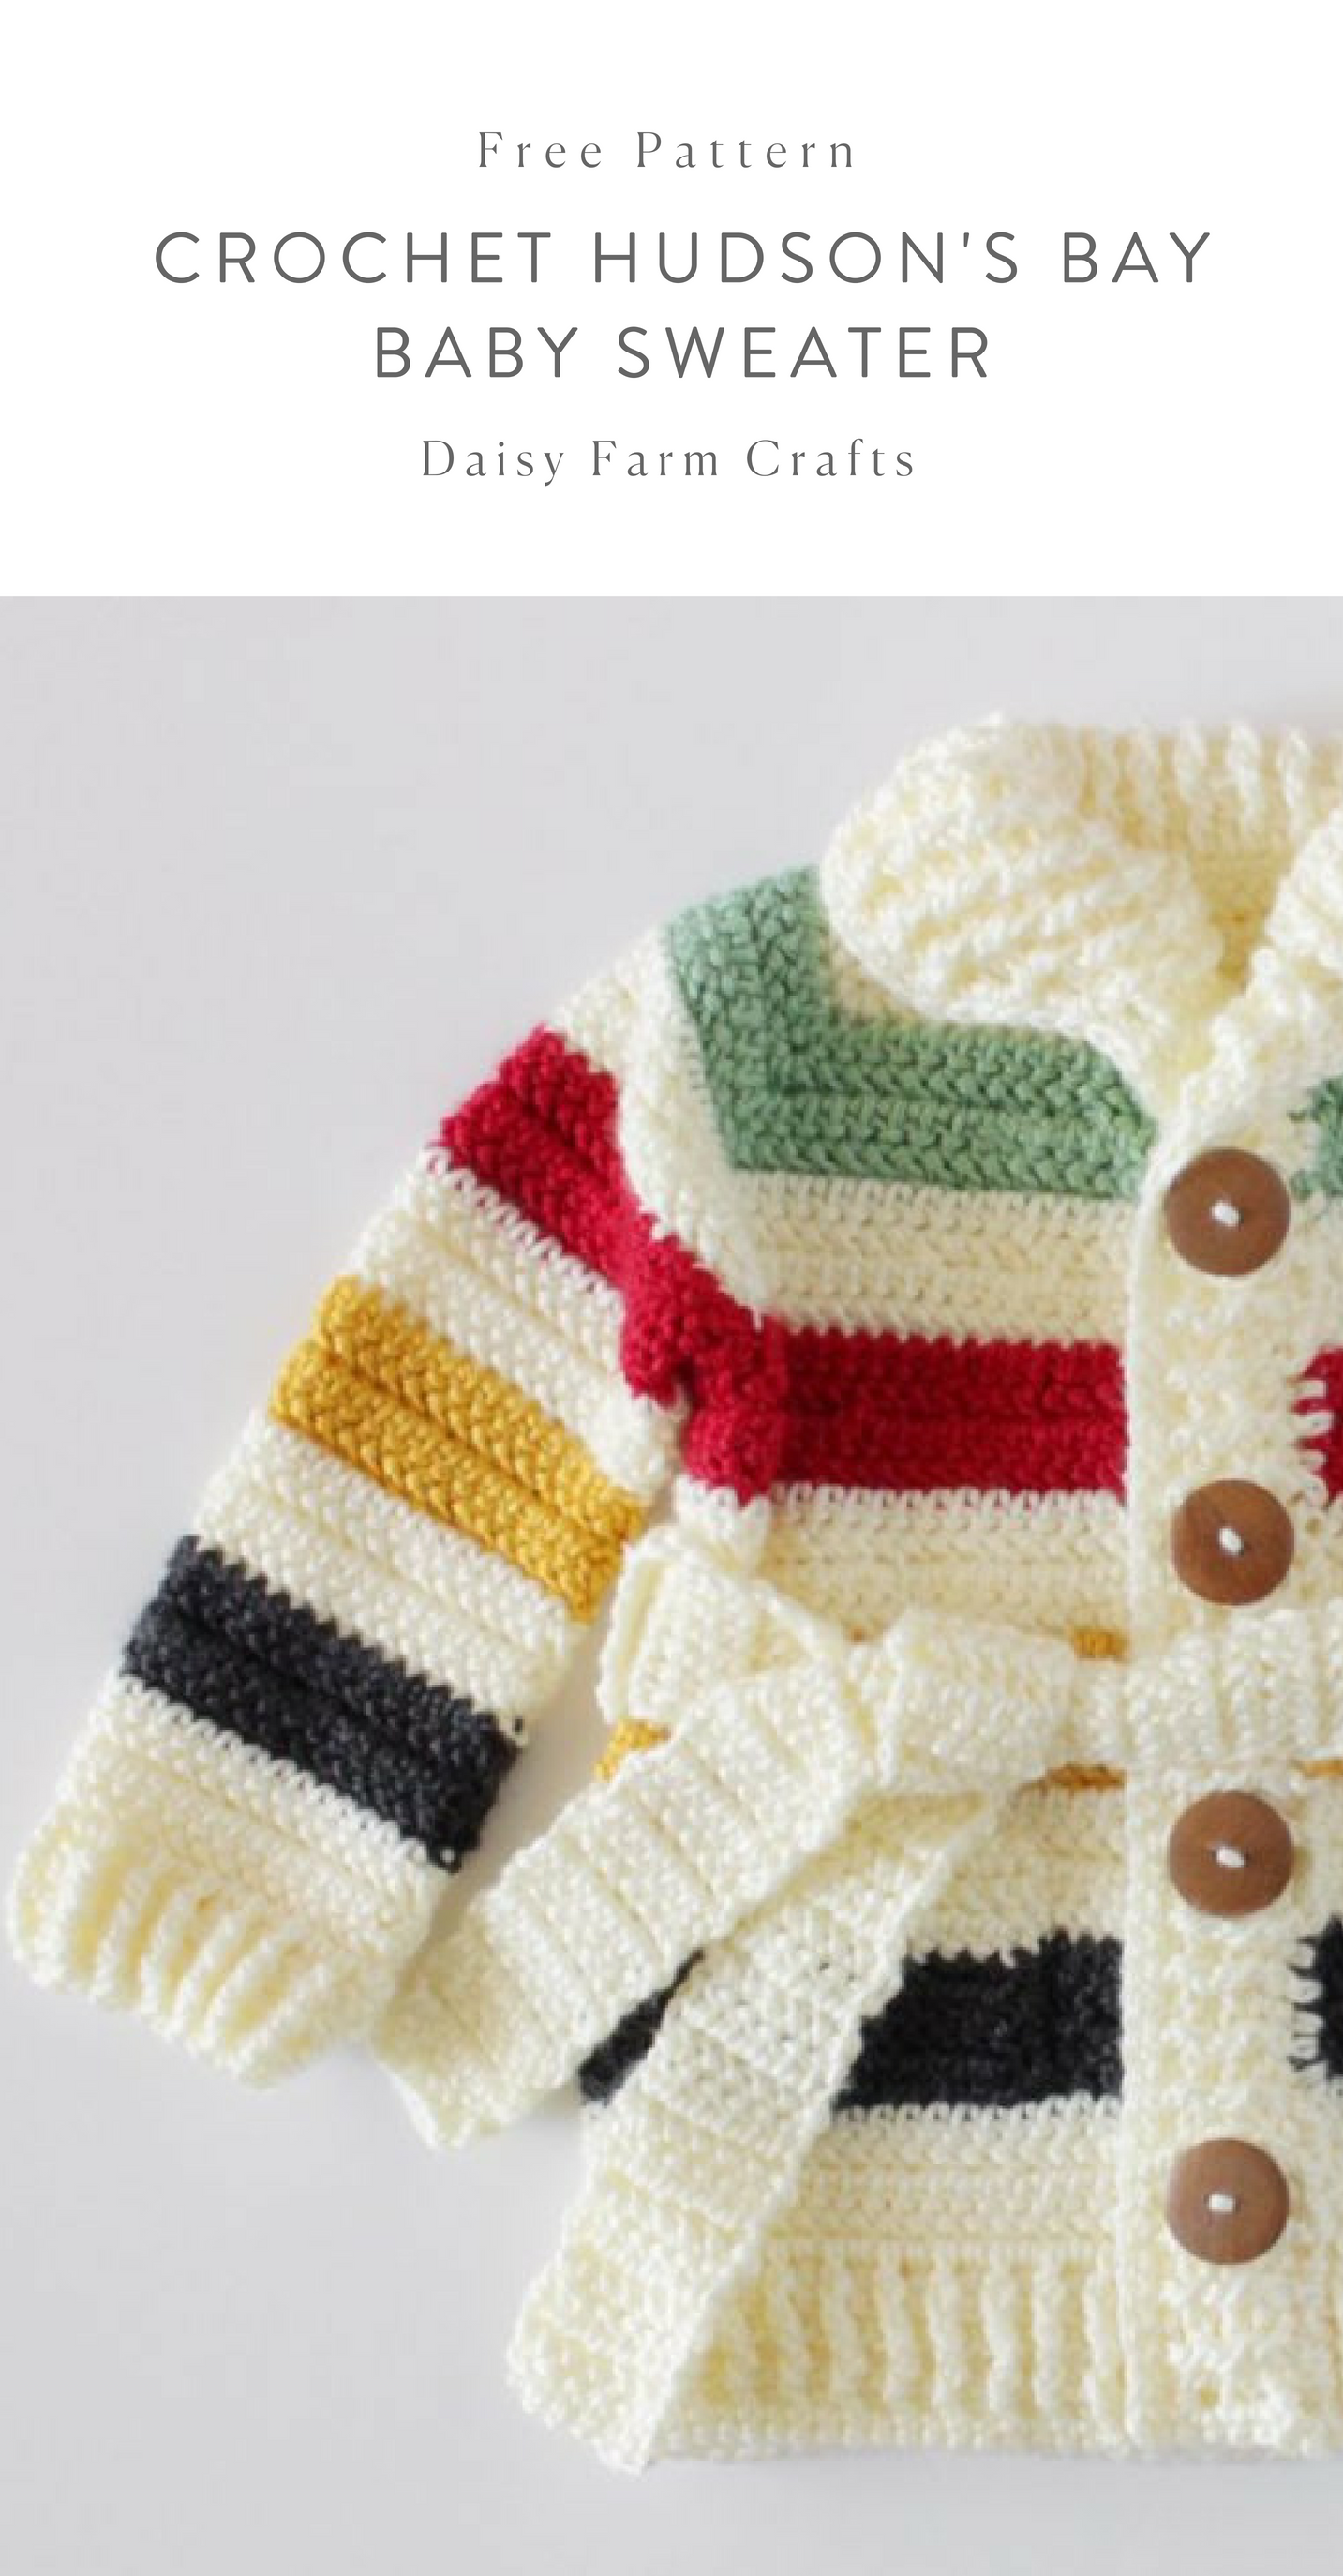 Free Pattern - Crochet Hudson\'s Bay Baby Sweater #crochet | Baby ...